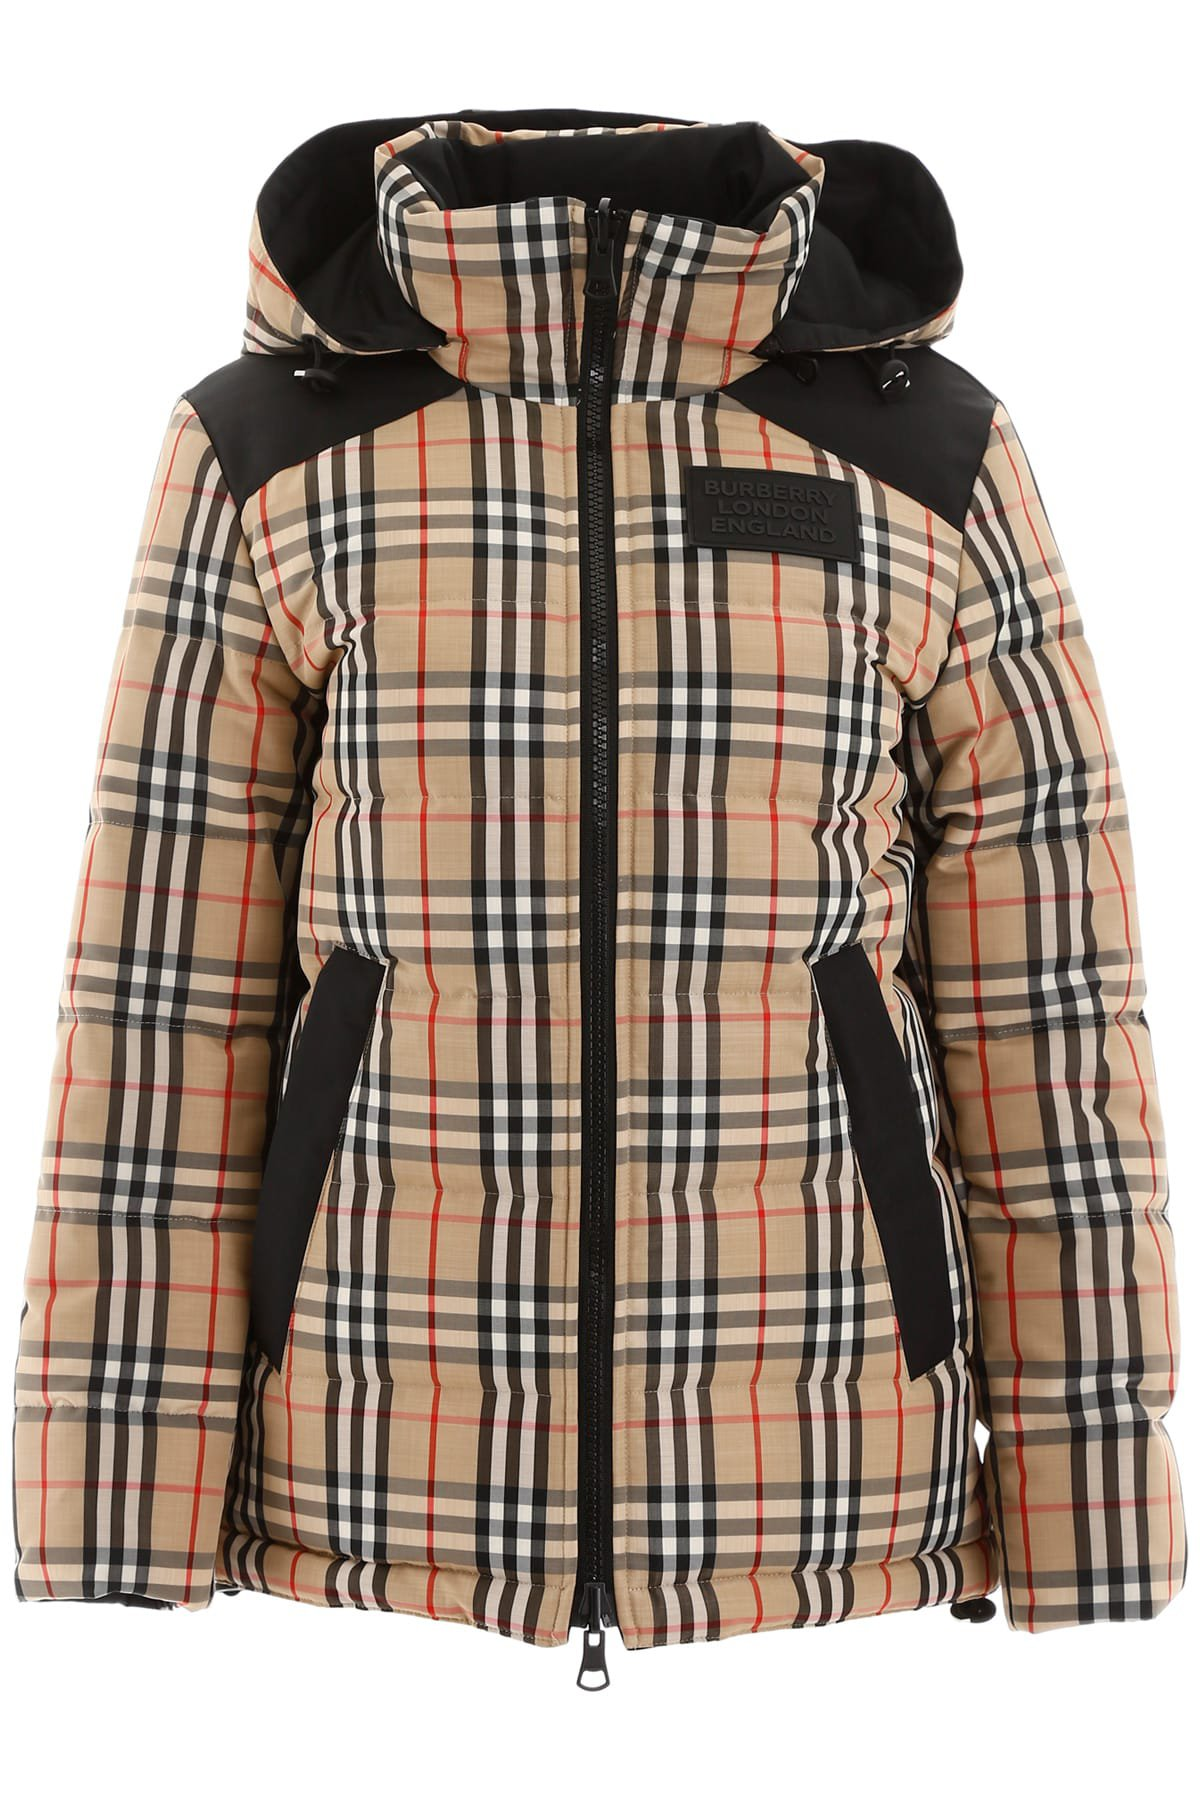 Burberry Reversible Puffer Jacket